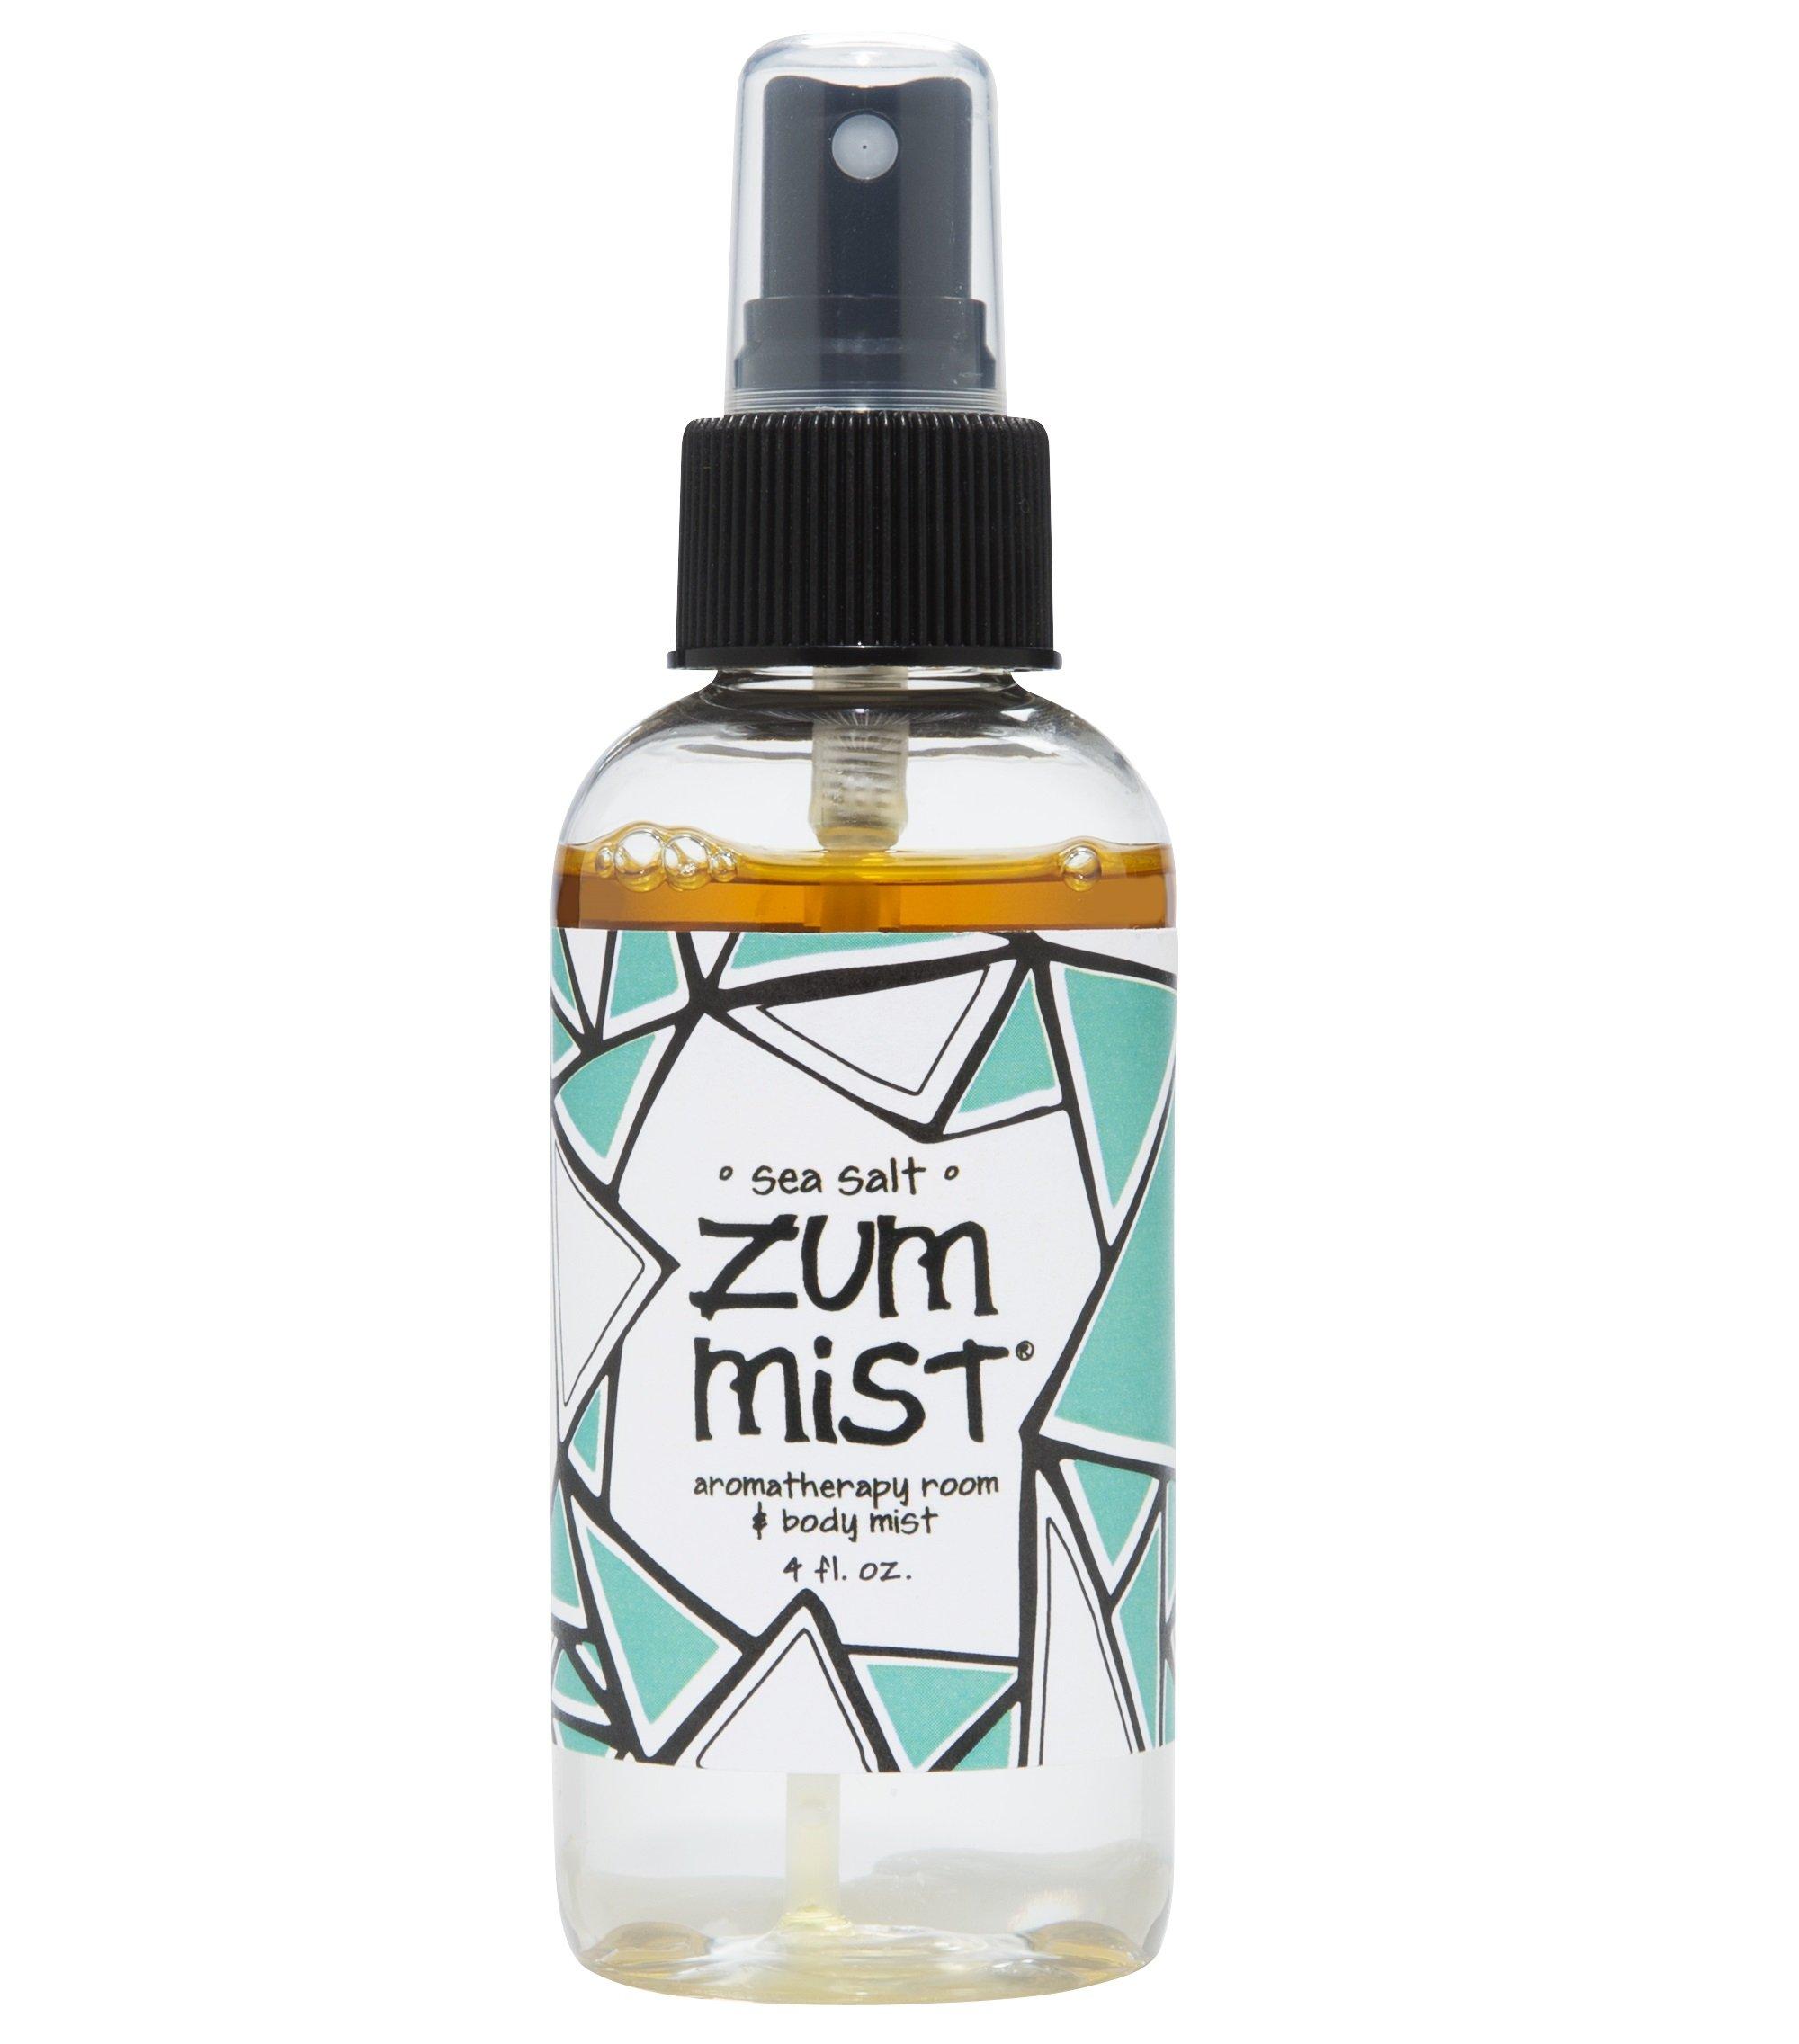 Indigo Wild Zum Mist Aromatherapy Spray, Sea Salt, 4 Fluid Ounce by Indigo Wild